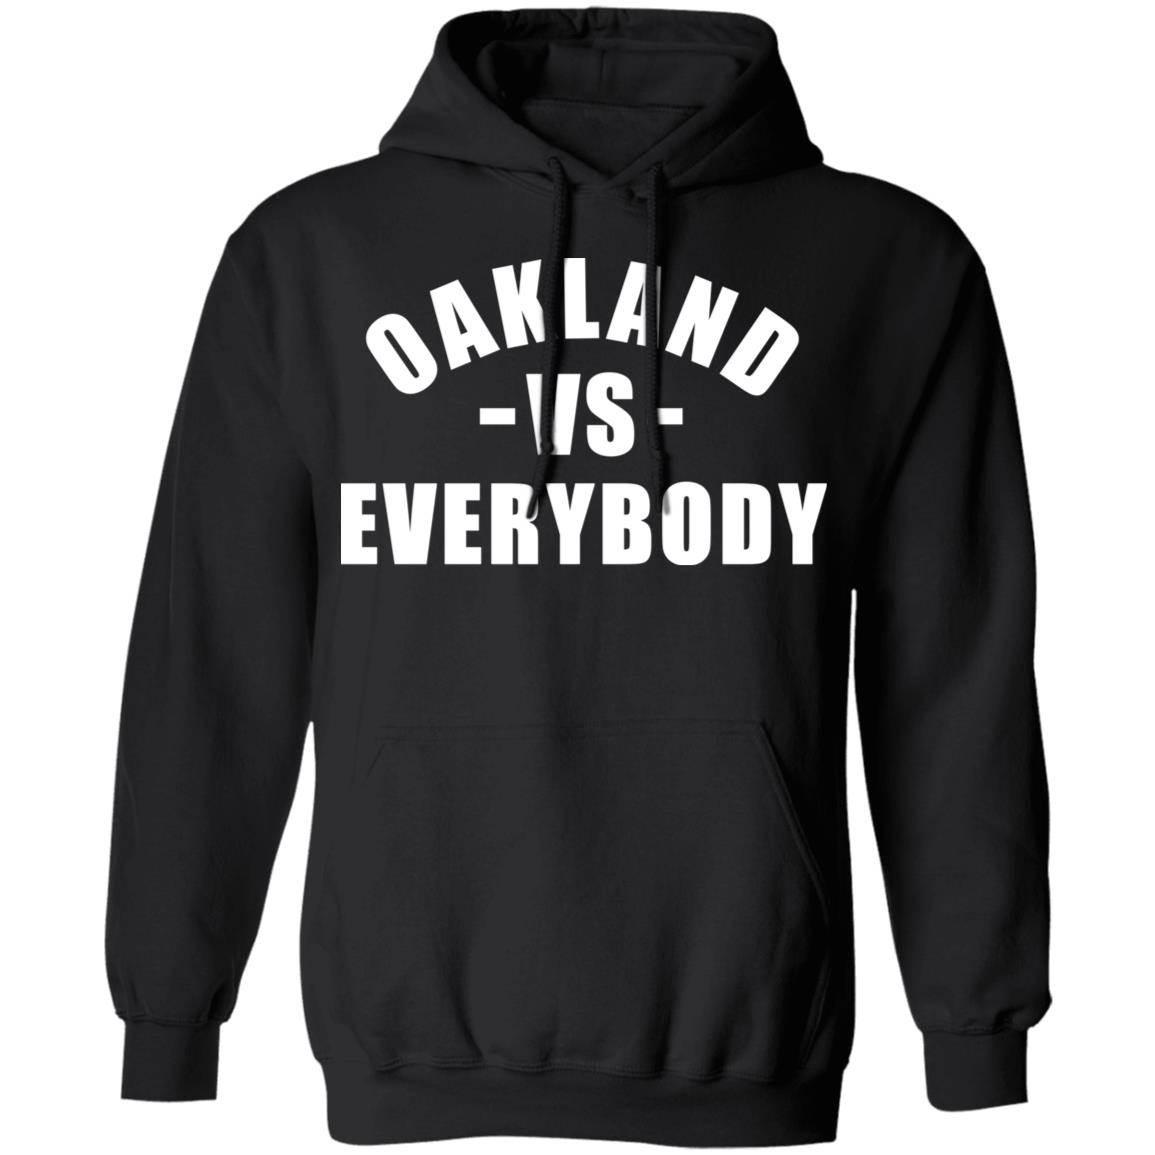 Oakland vs Everybody Hoodie for Men, Women